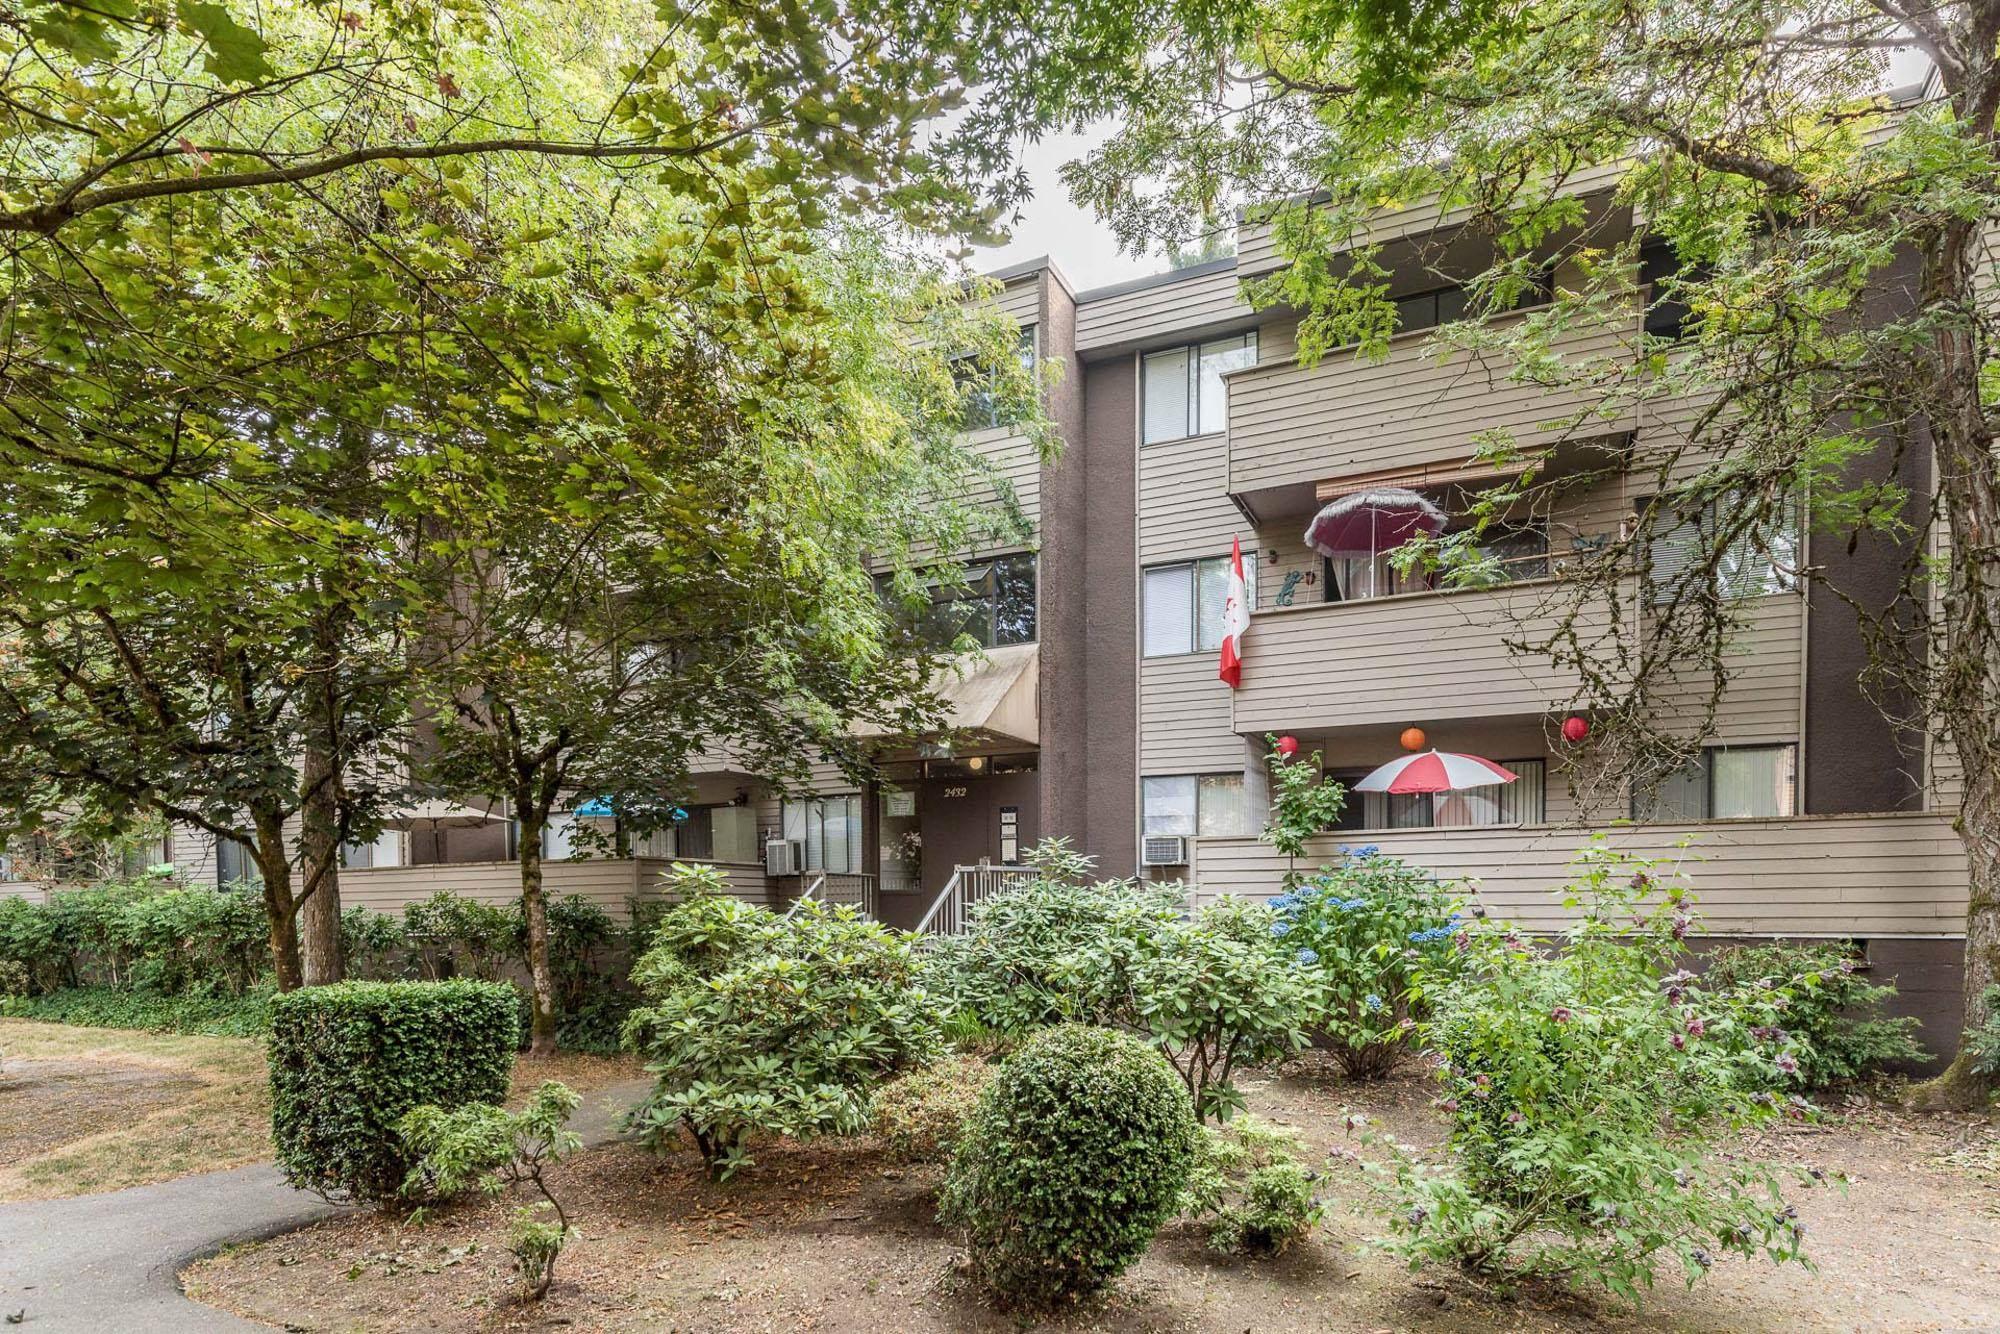 33 2432 WILSON AVENUE - Central Pt Coquitlam Apartment/Condo for sale, 1 Bedroom (R2626328)